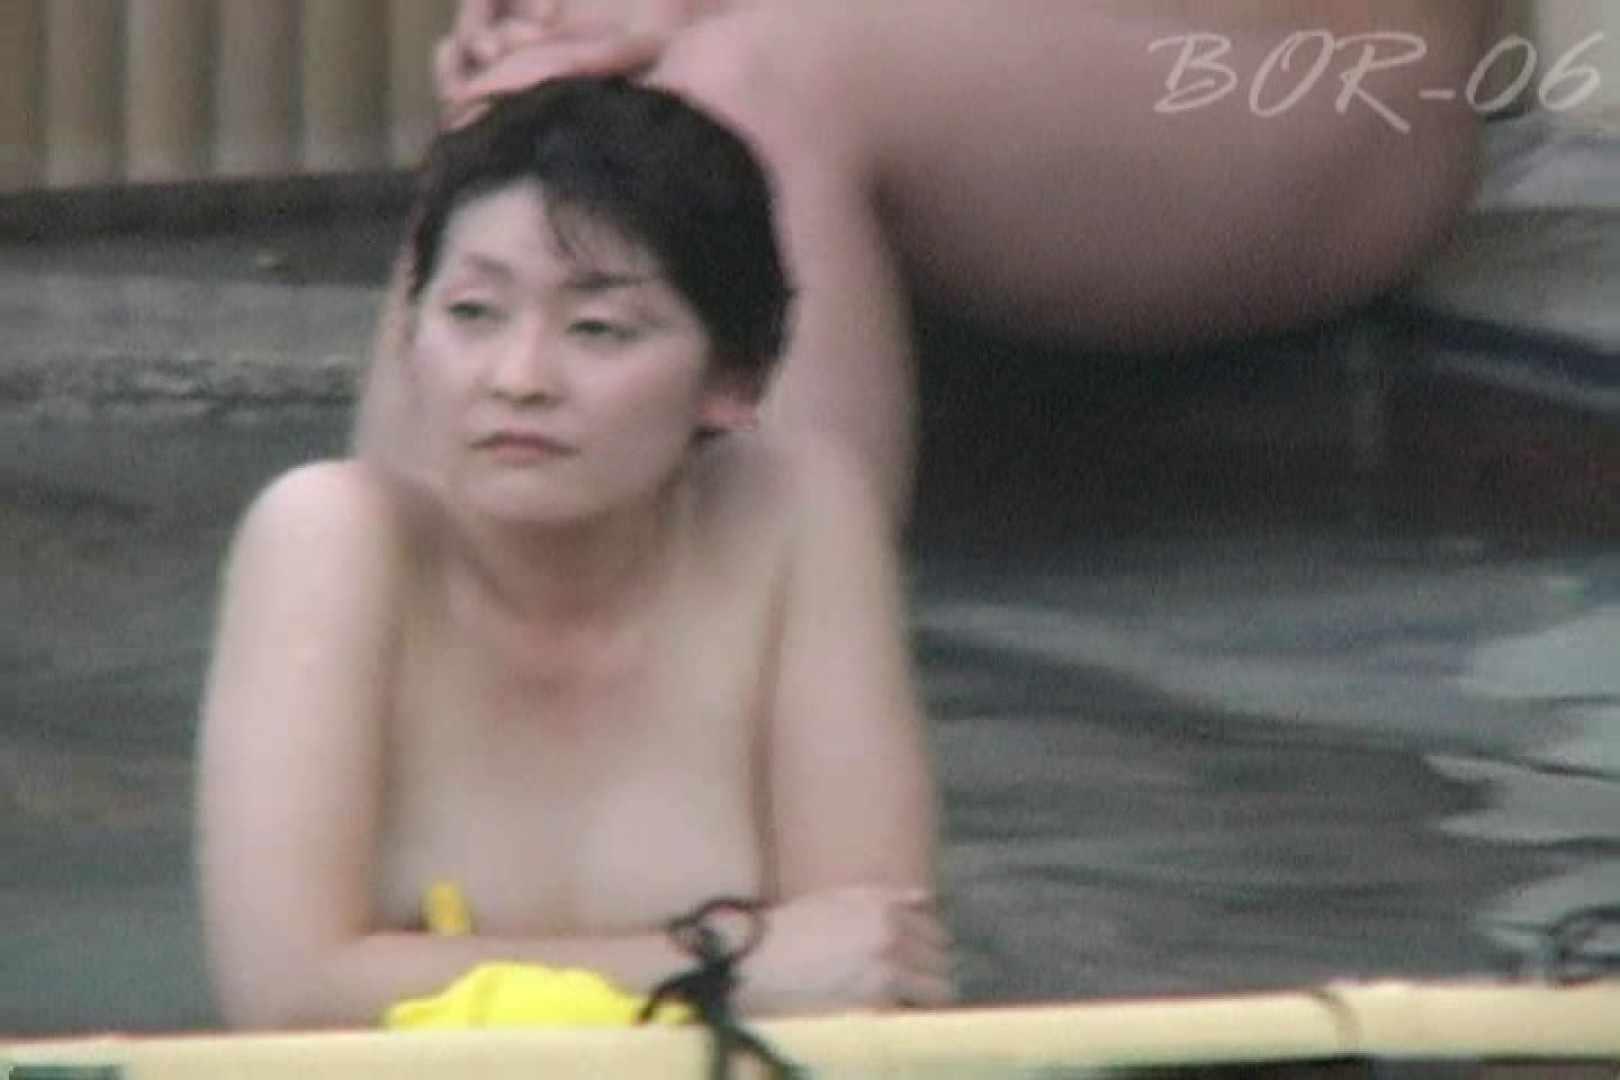 Aquaな露天風呂Vol.523 盗撮映像  93Pix 4